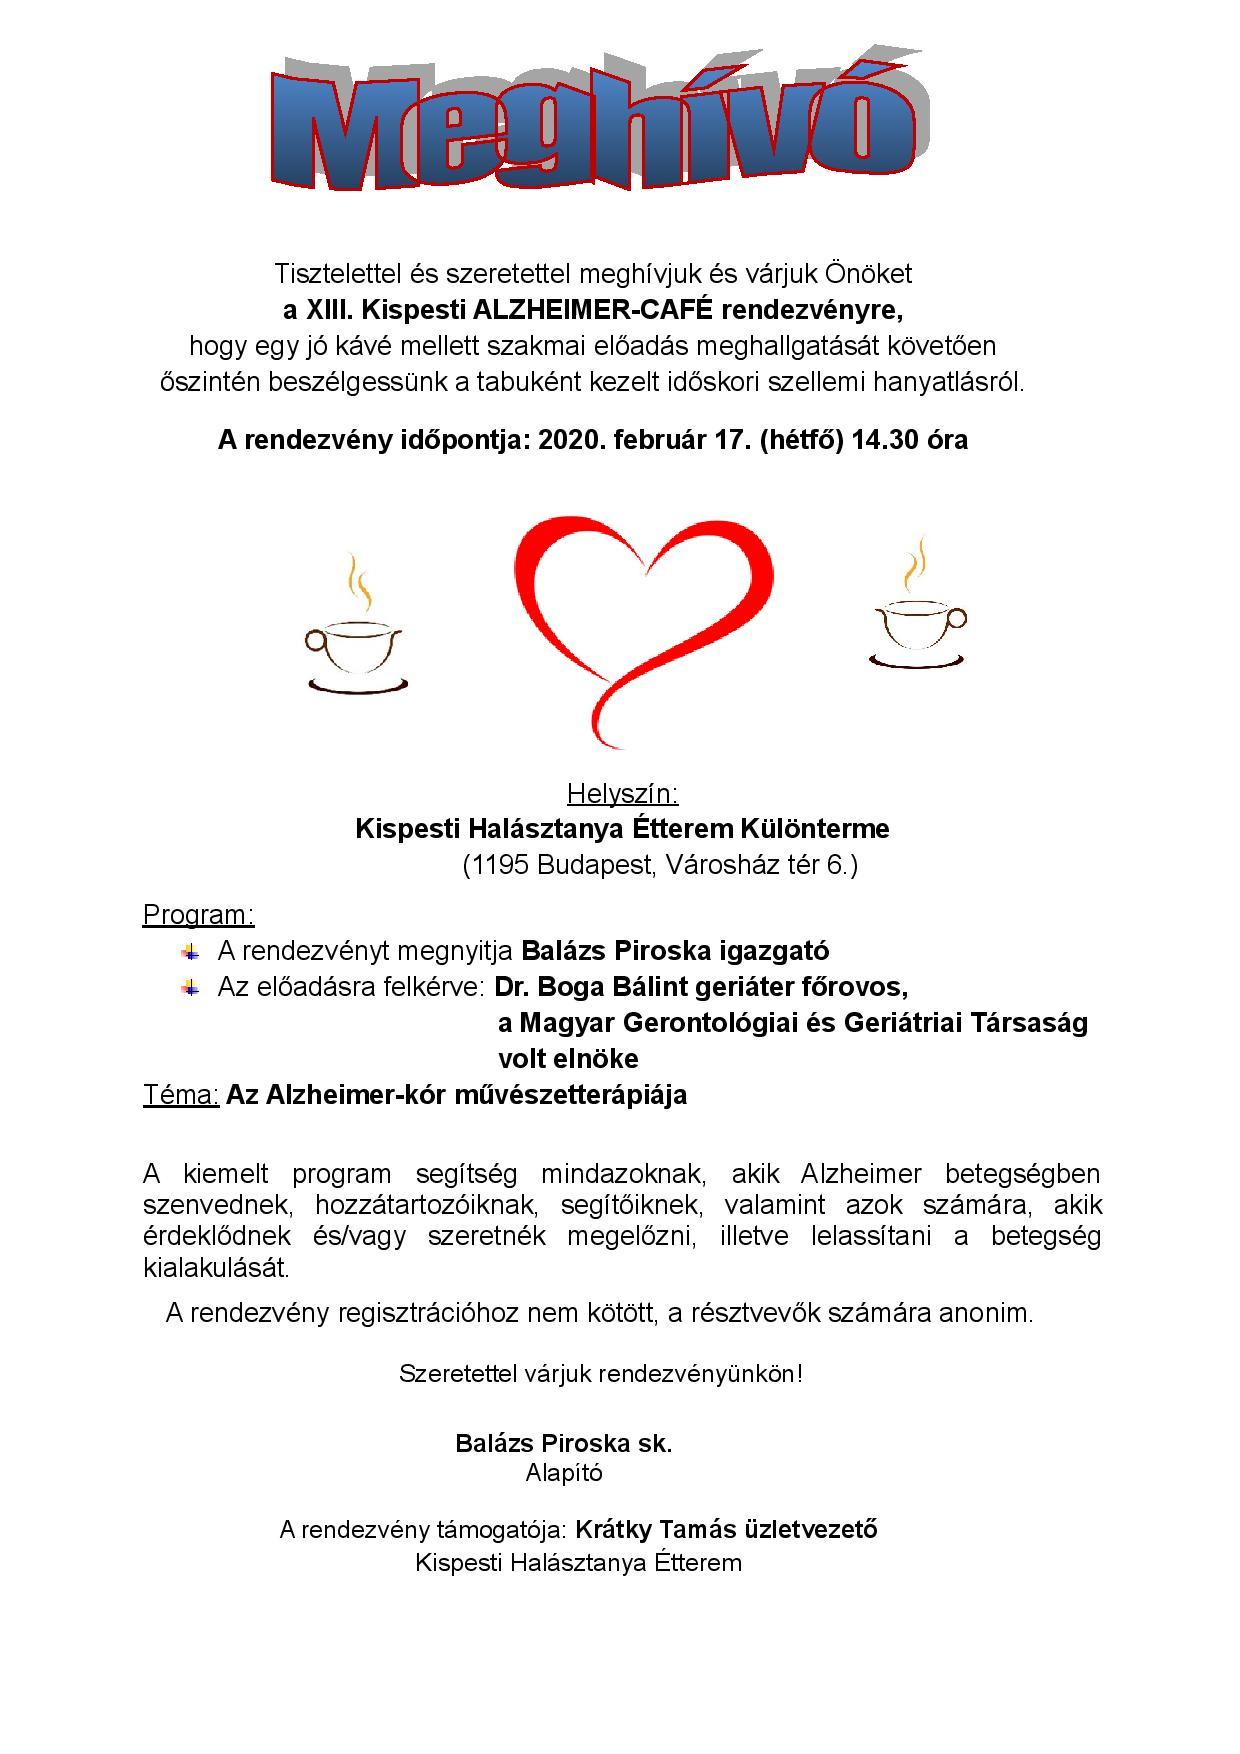 alzheimer-cafe20200217